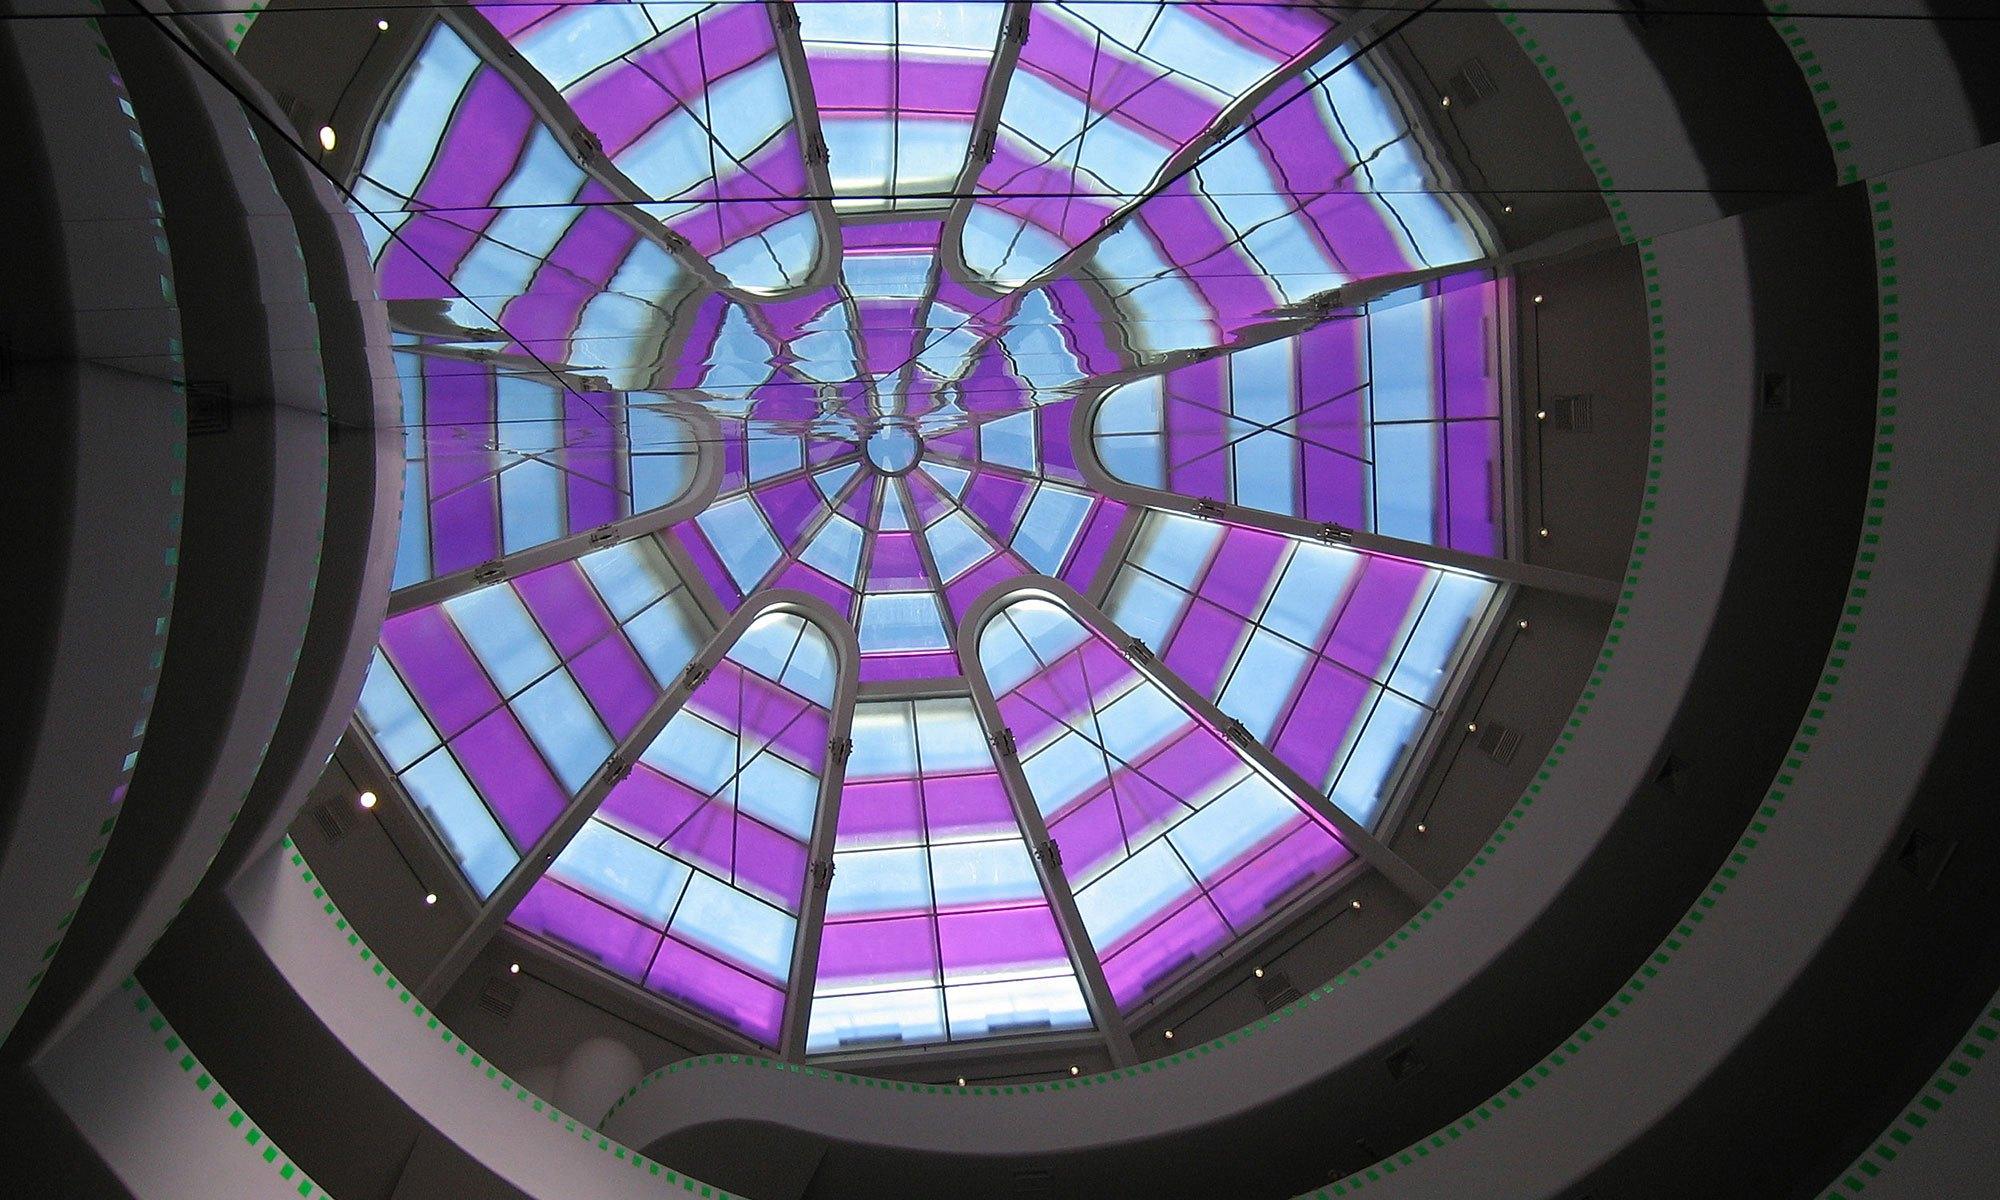 New York Guggenheim Glass Ceiling